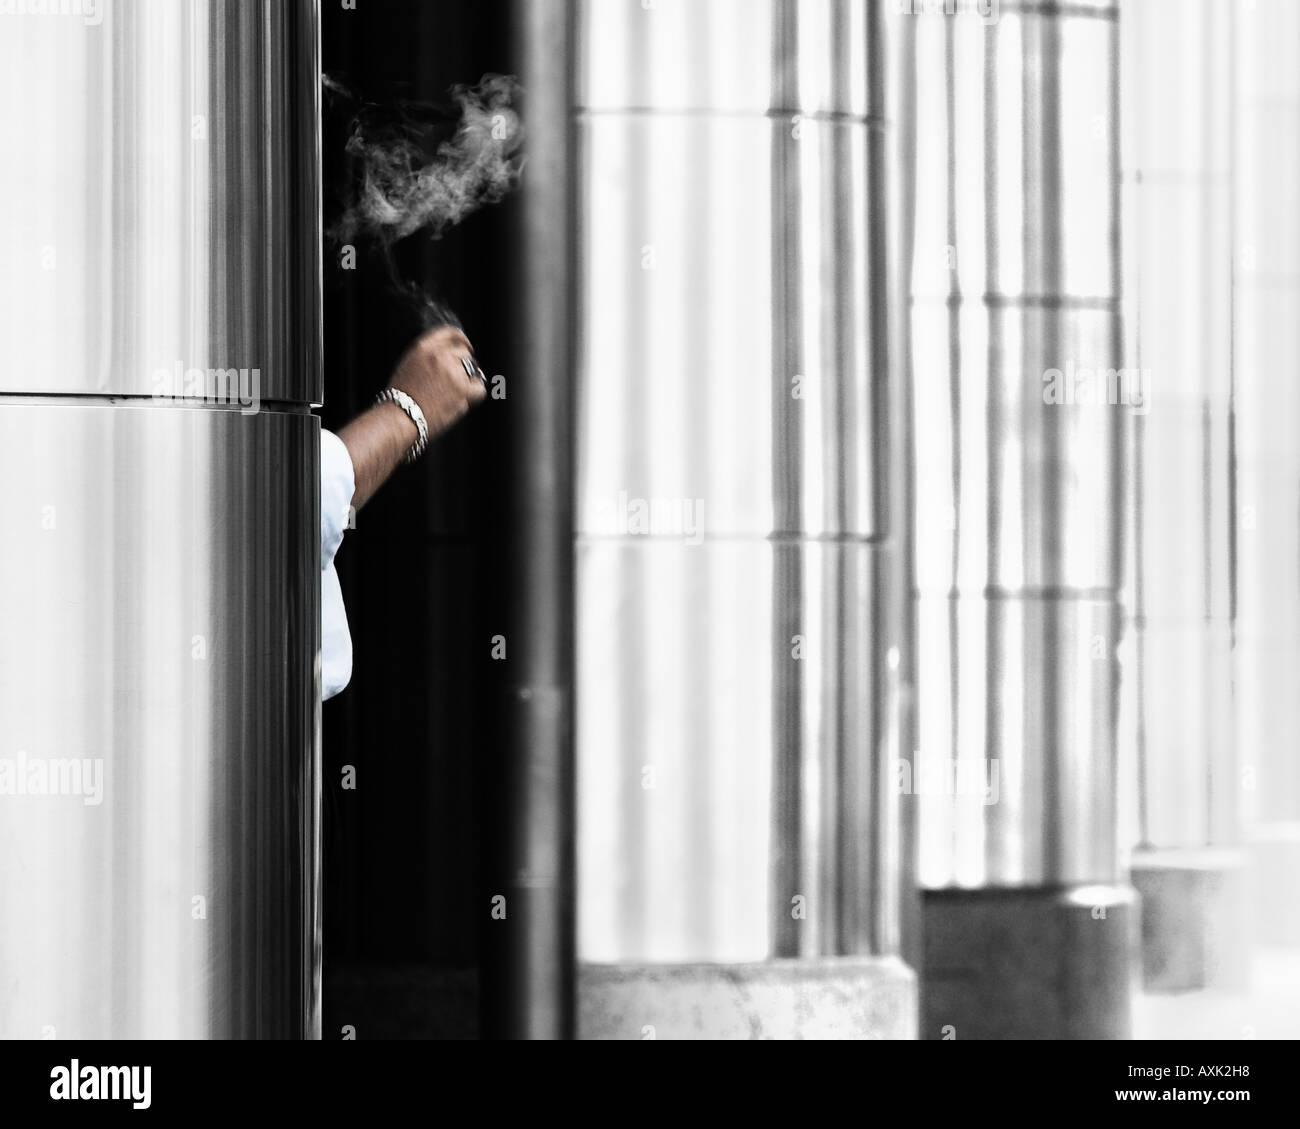 had arm bracelet hold hide smoke cigarette pillars lines white black doorway - Stock Image